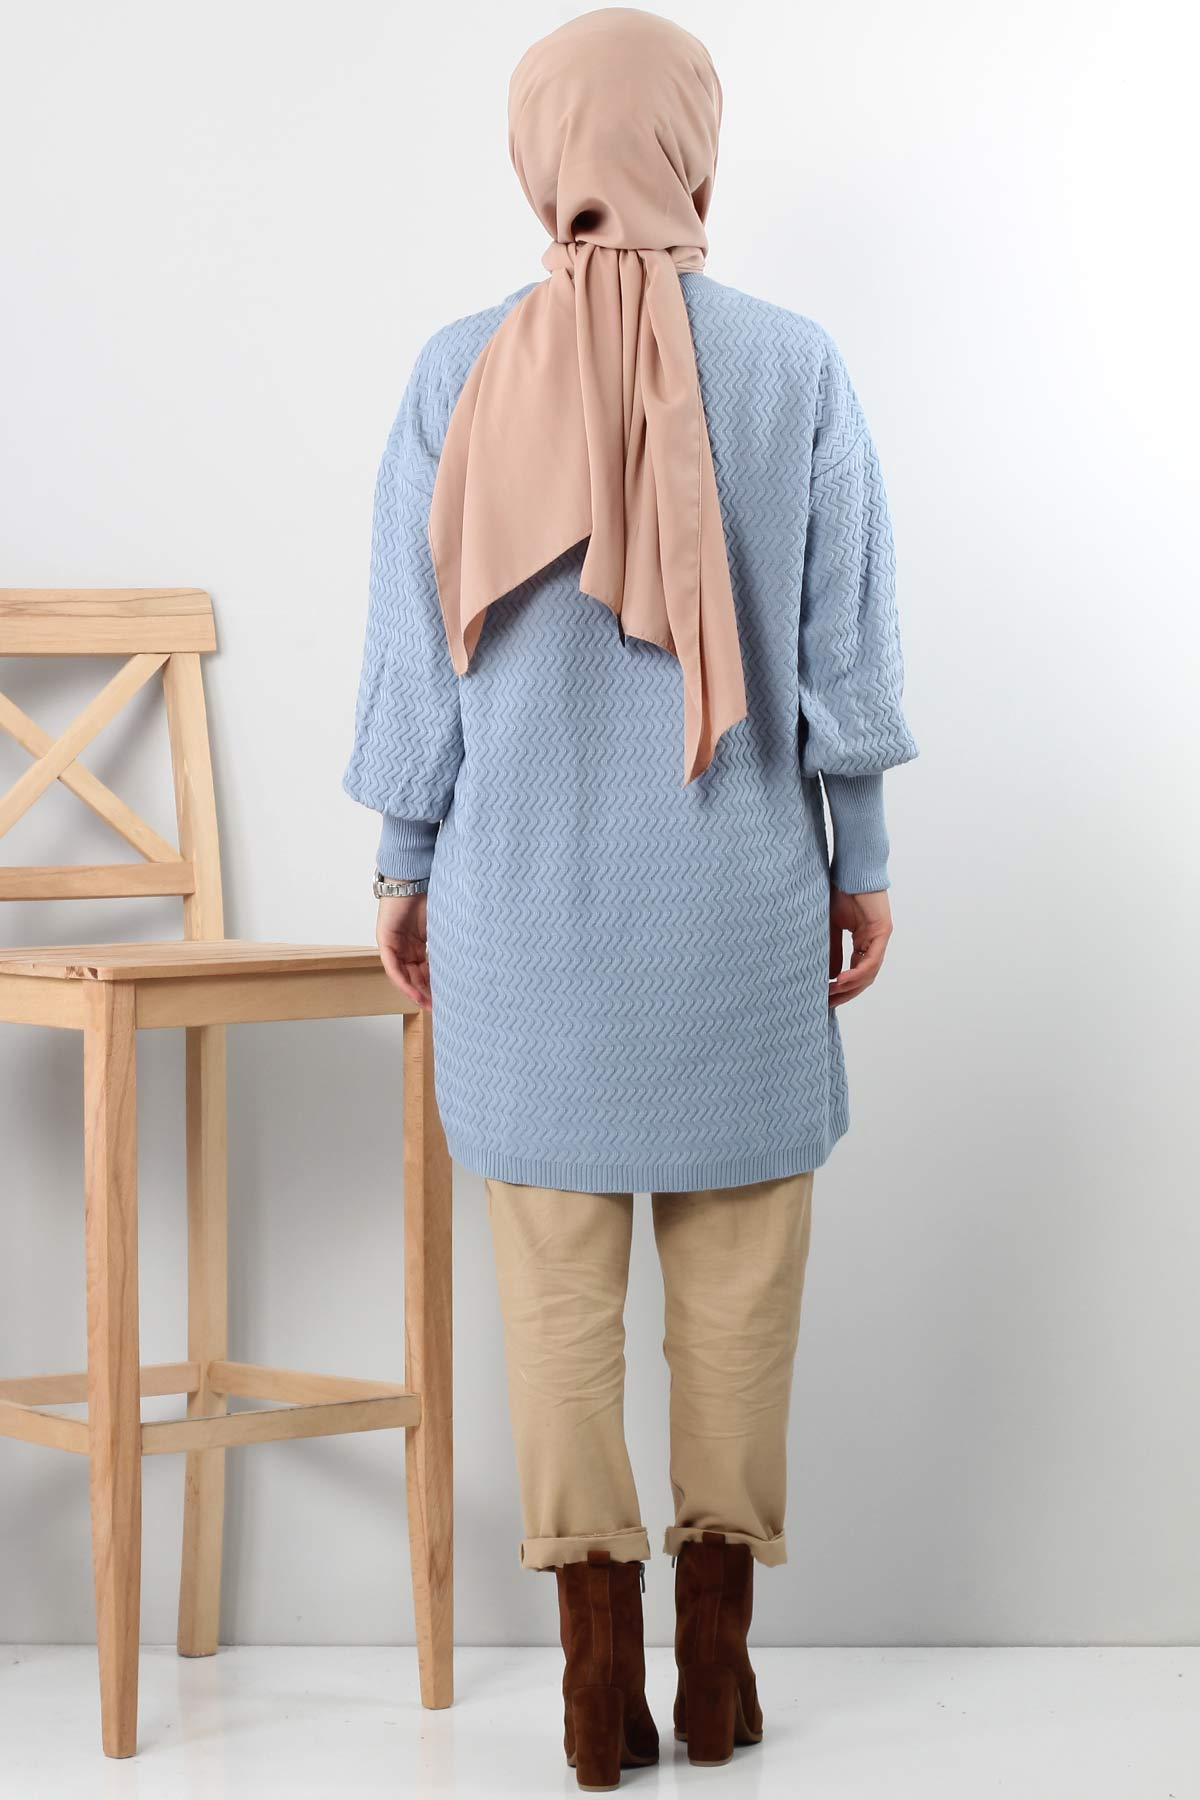 Zigzag Patterned Tricot Tunic TSD5180 BLUE